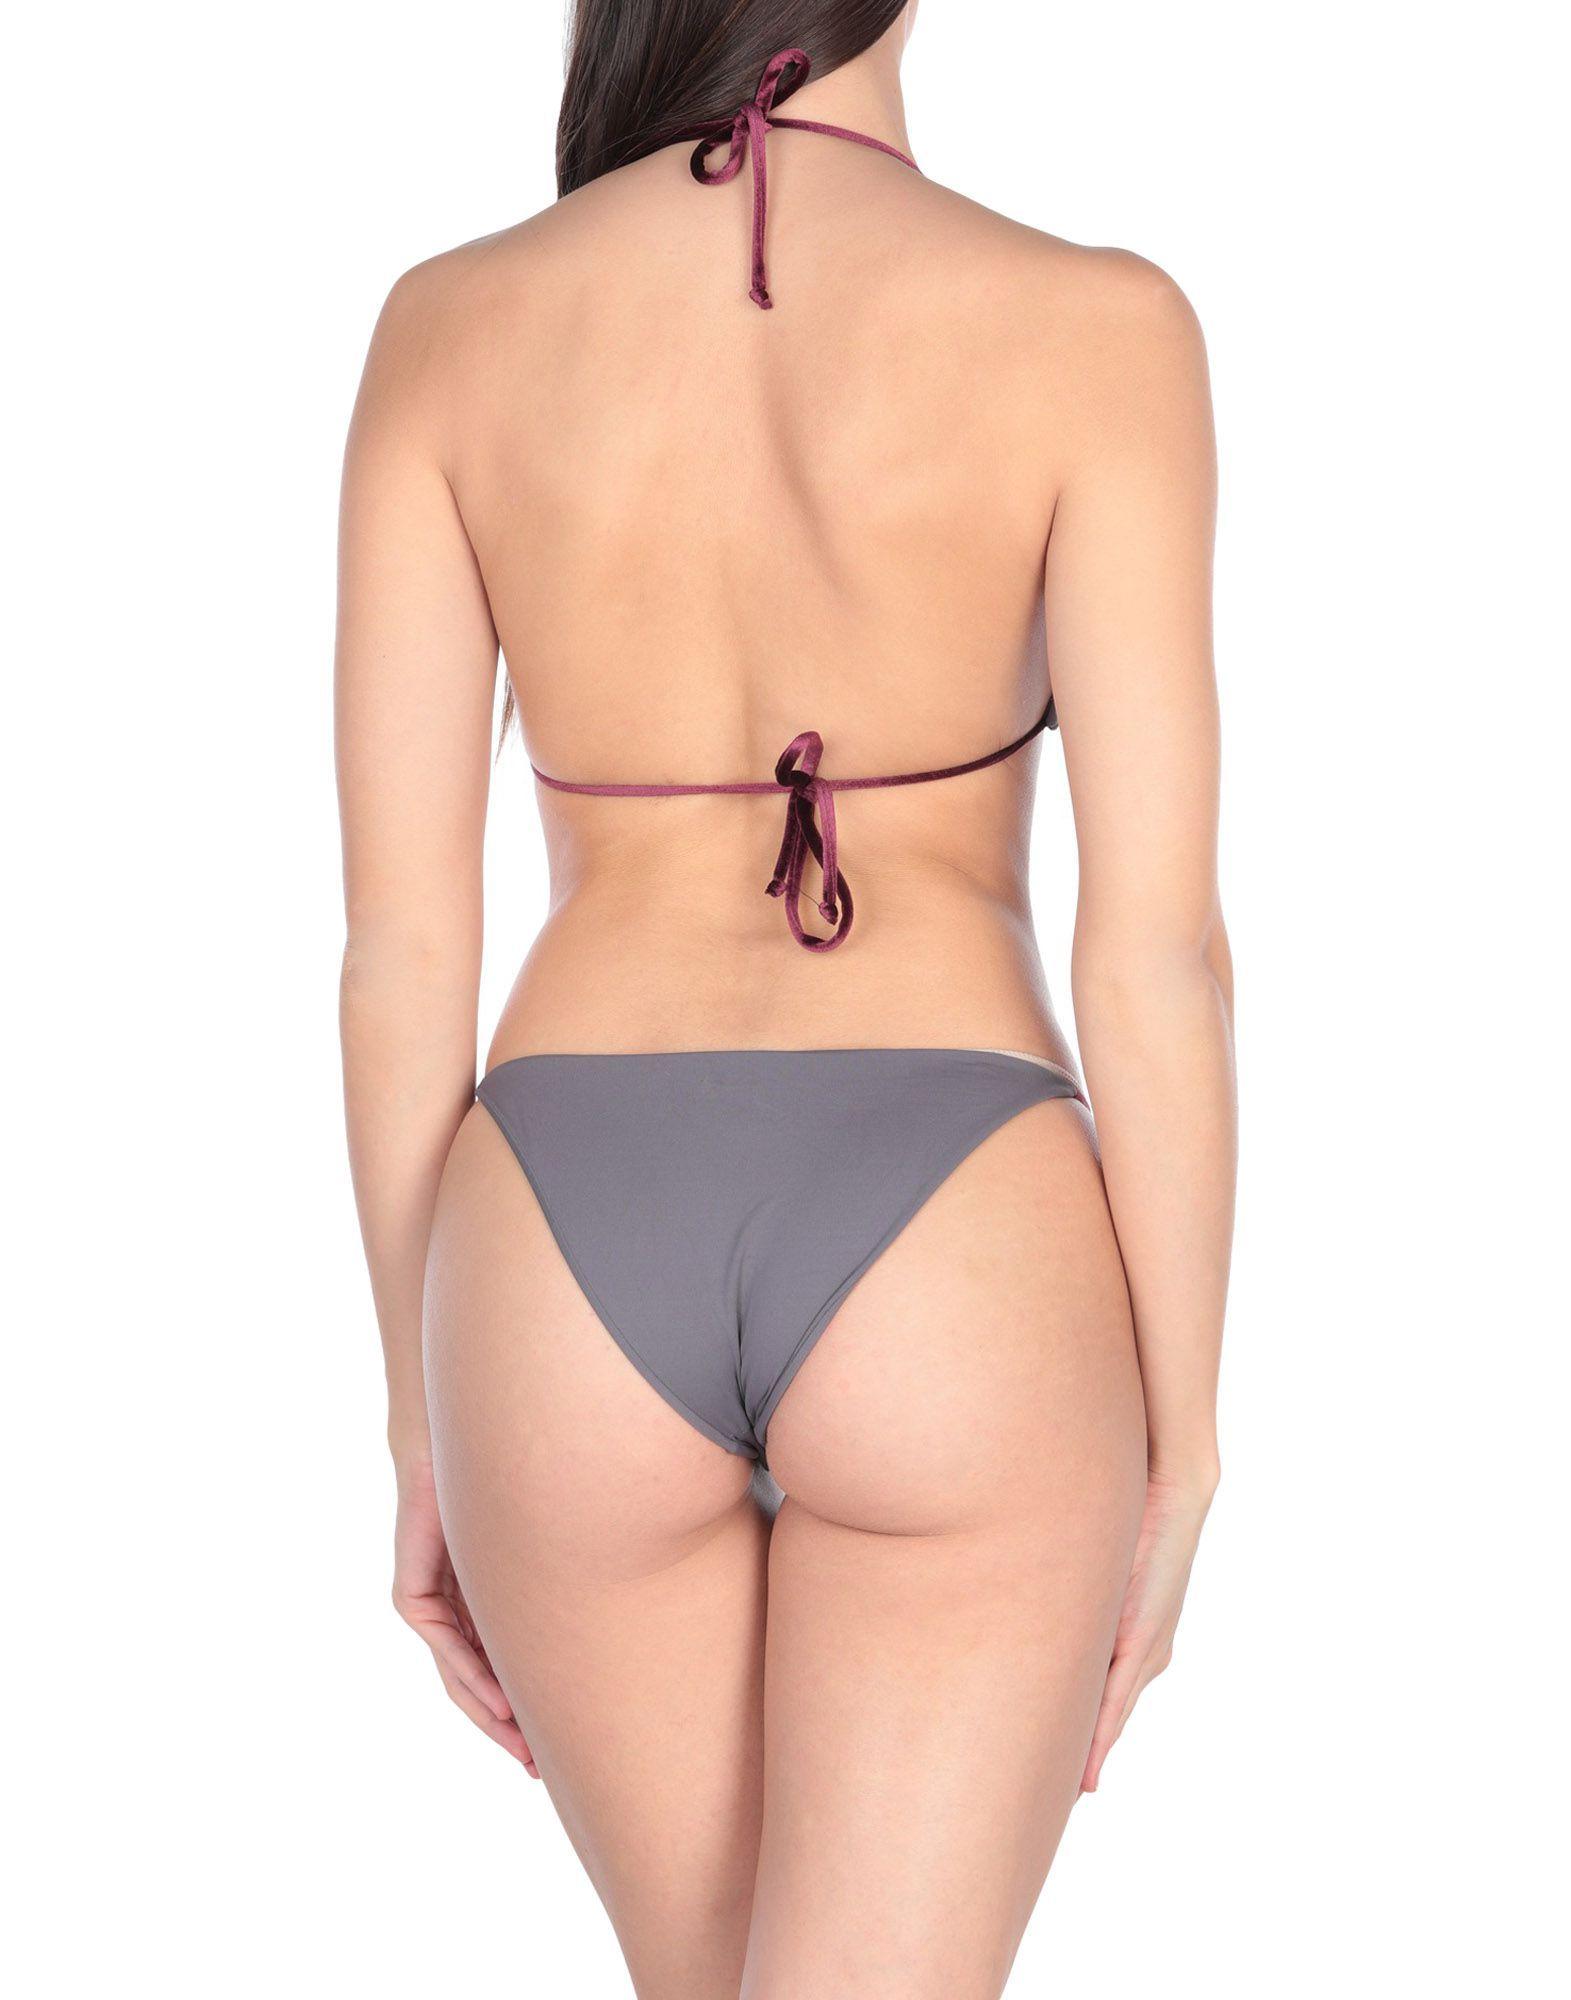 S And S Lead String Bikini Set